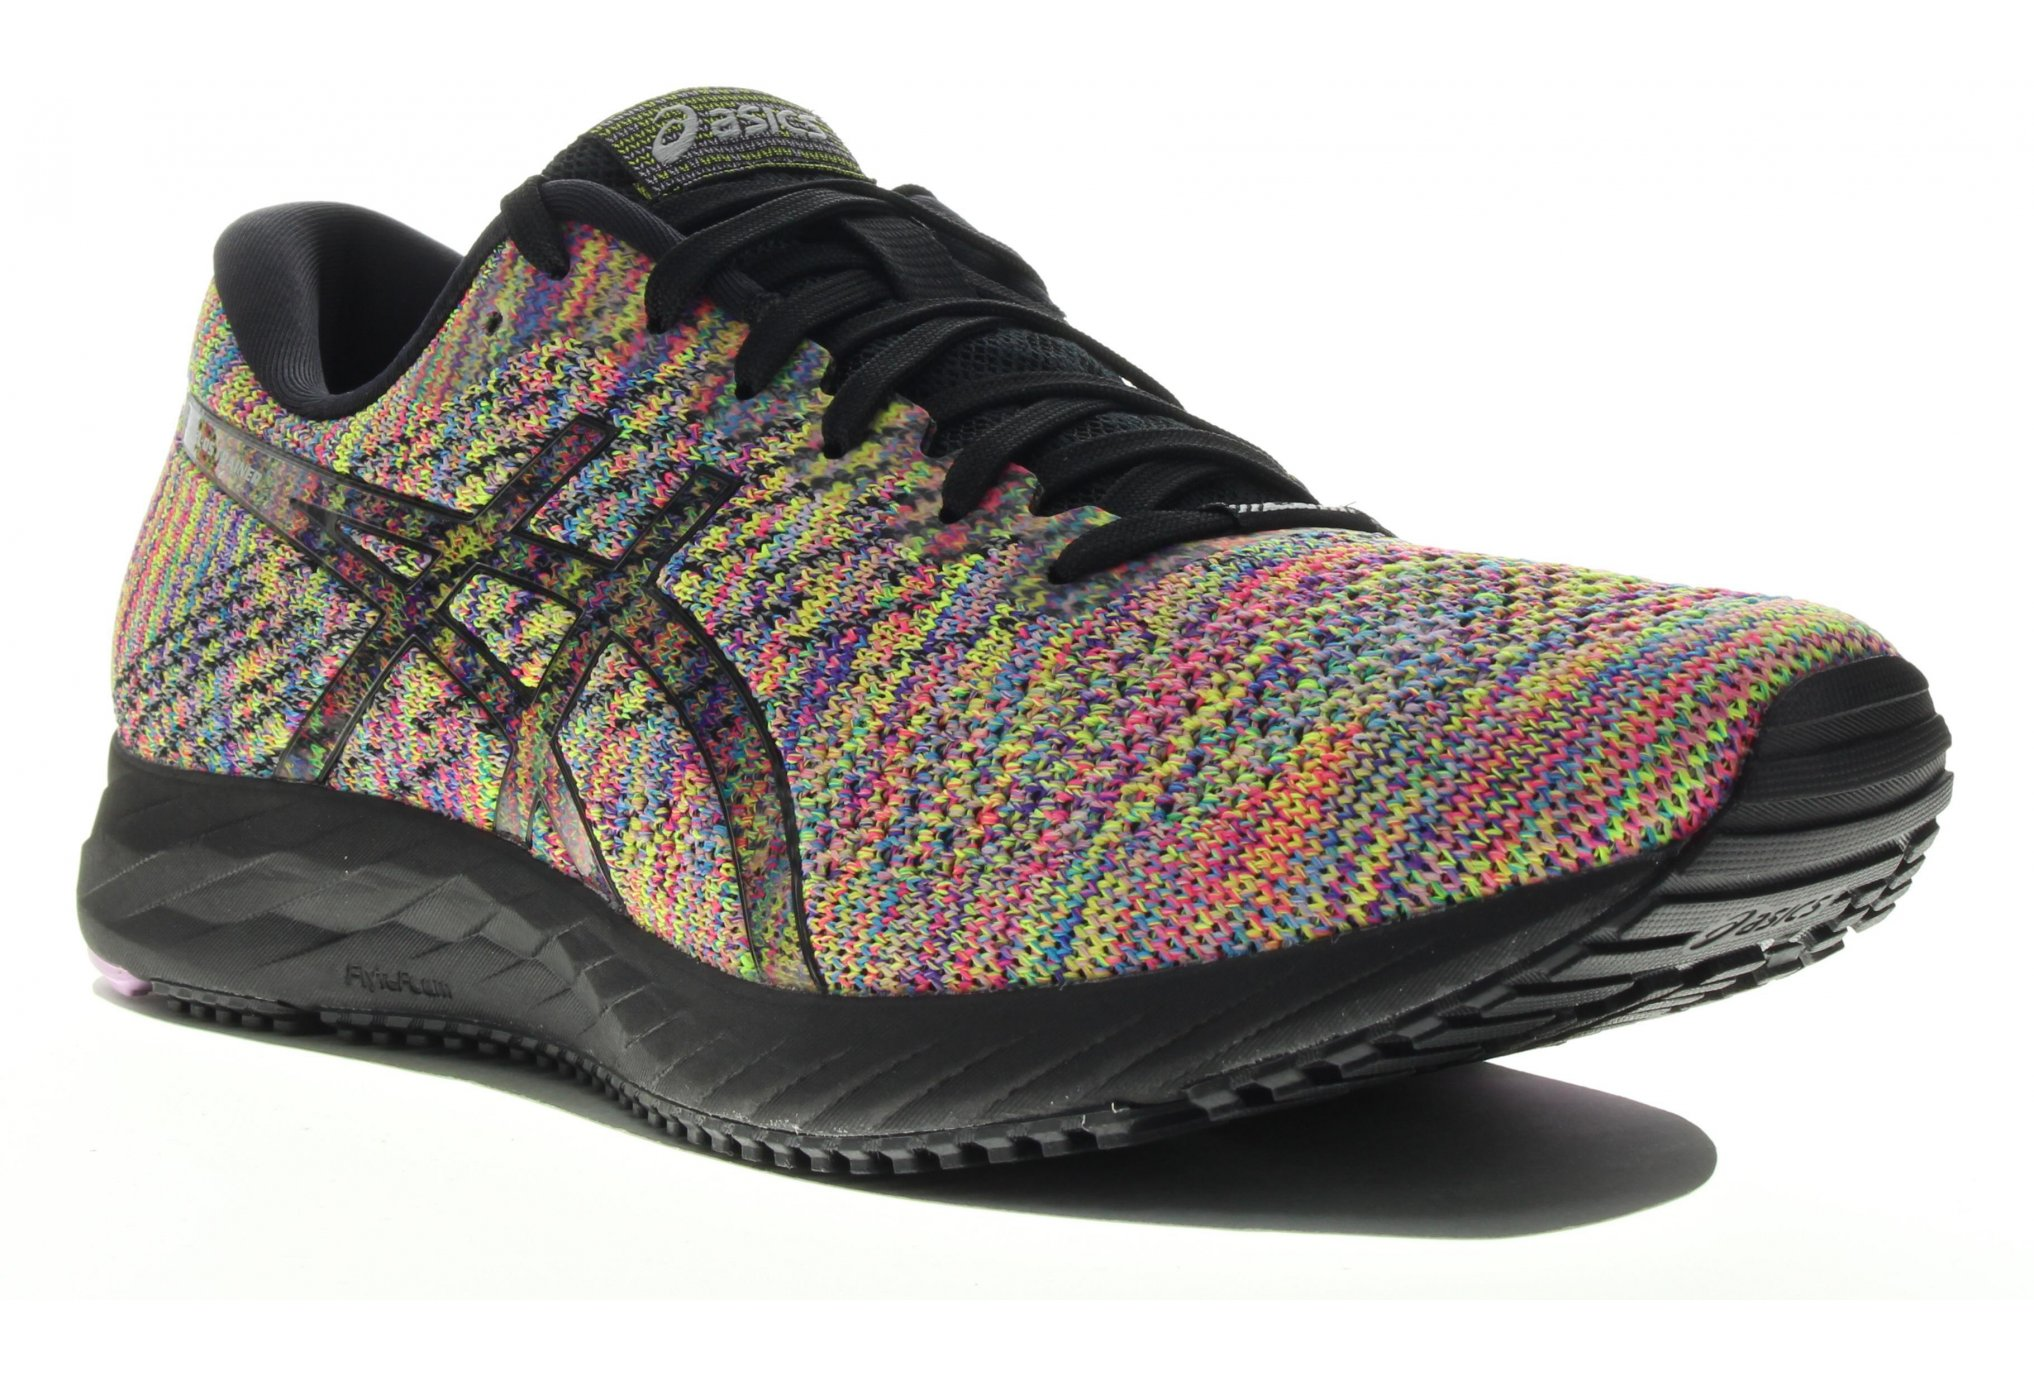 Asics Gel-DS Trainer 24 Optimism W Chaussures running femme